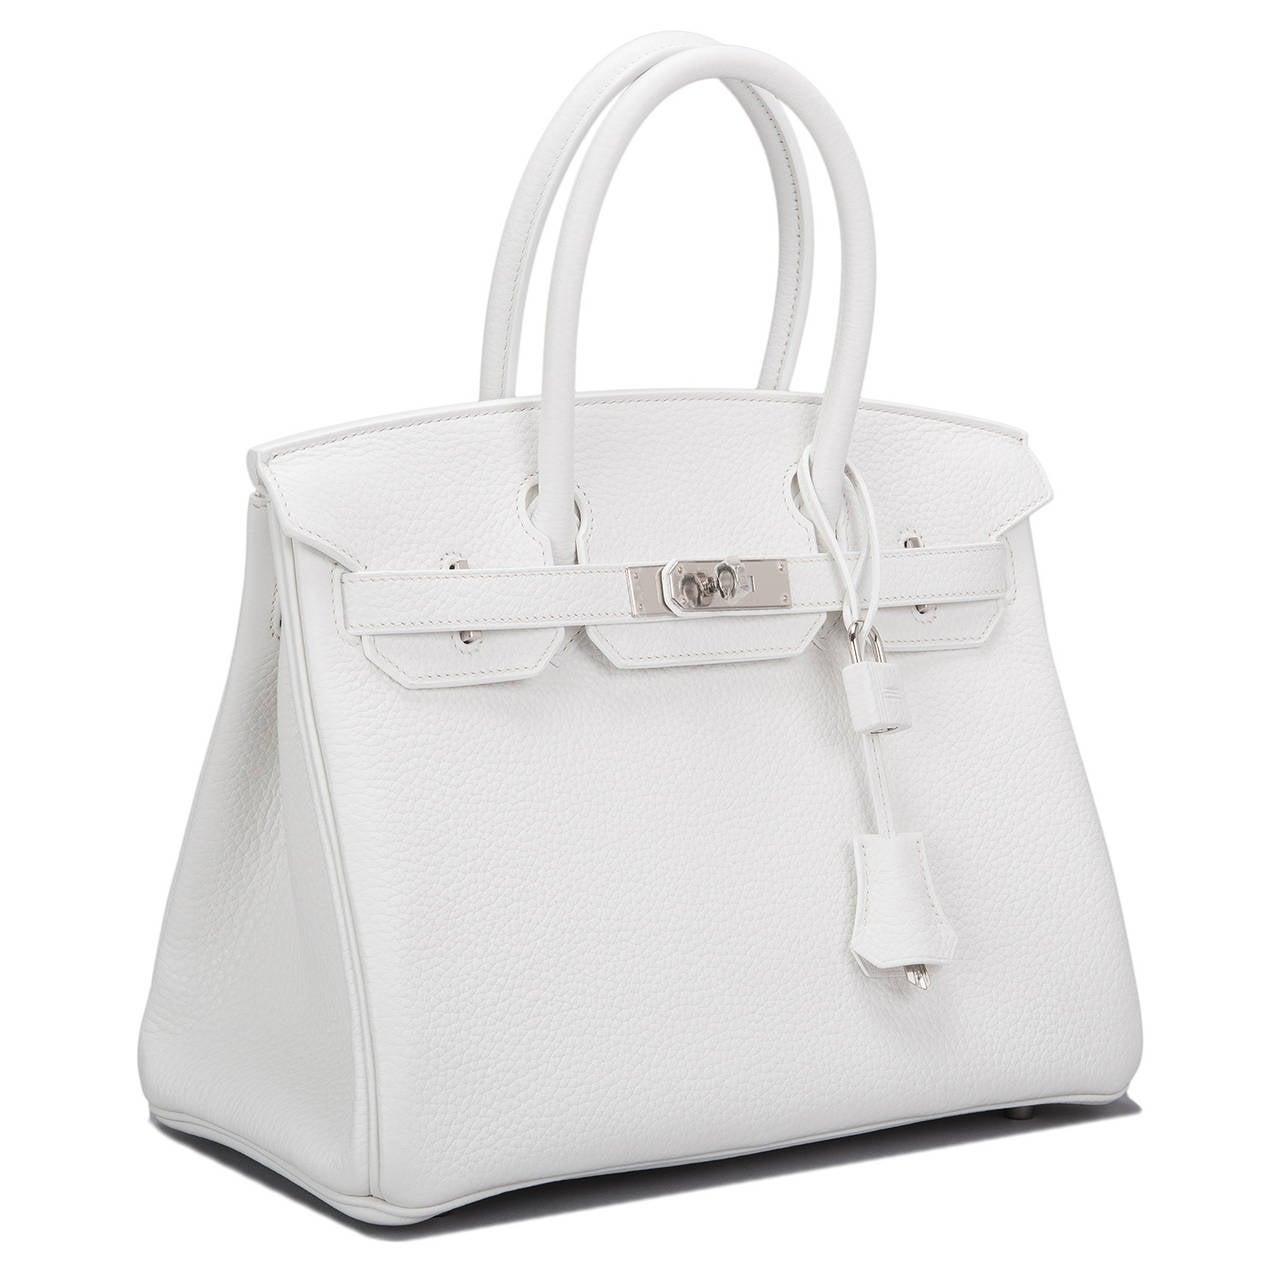 Hermes Birkin Bags Official Website Jelly Birkin Bag